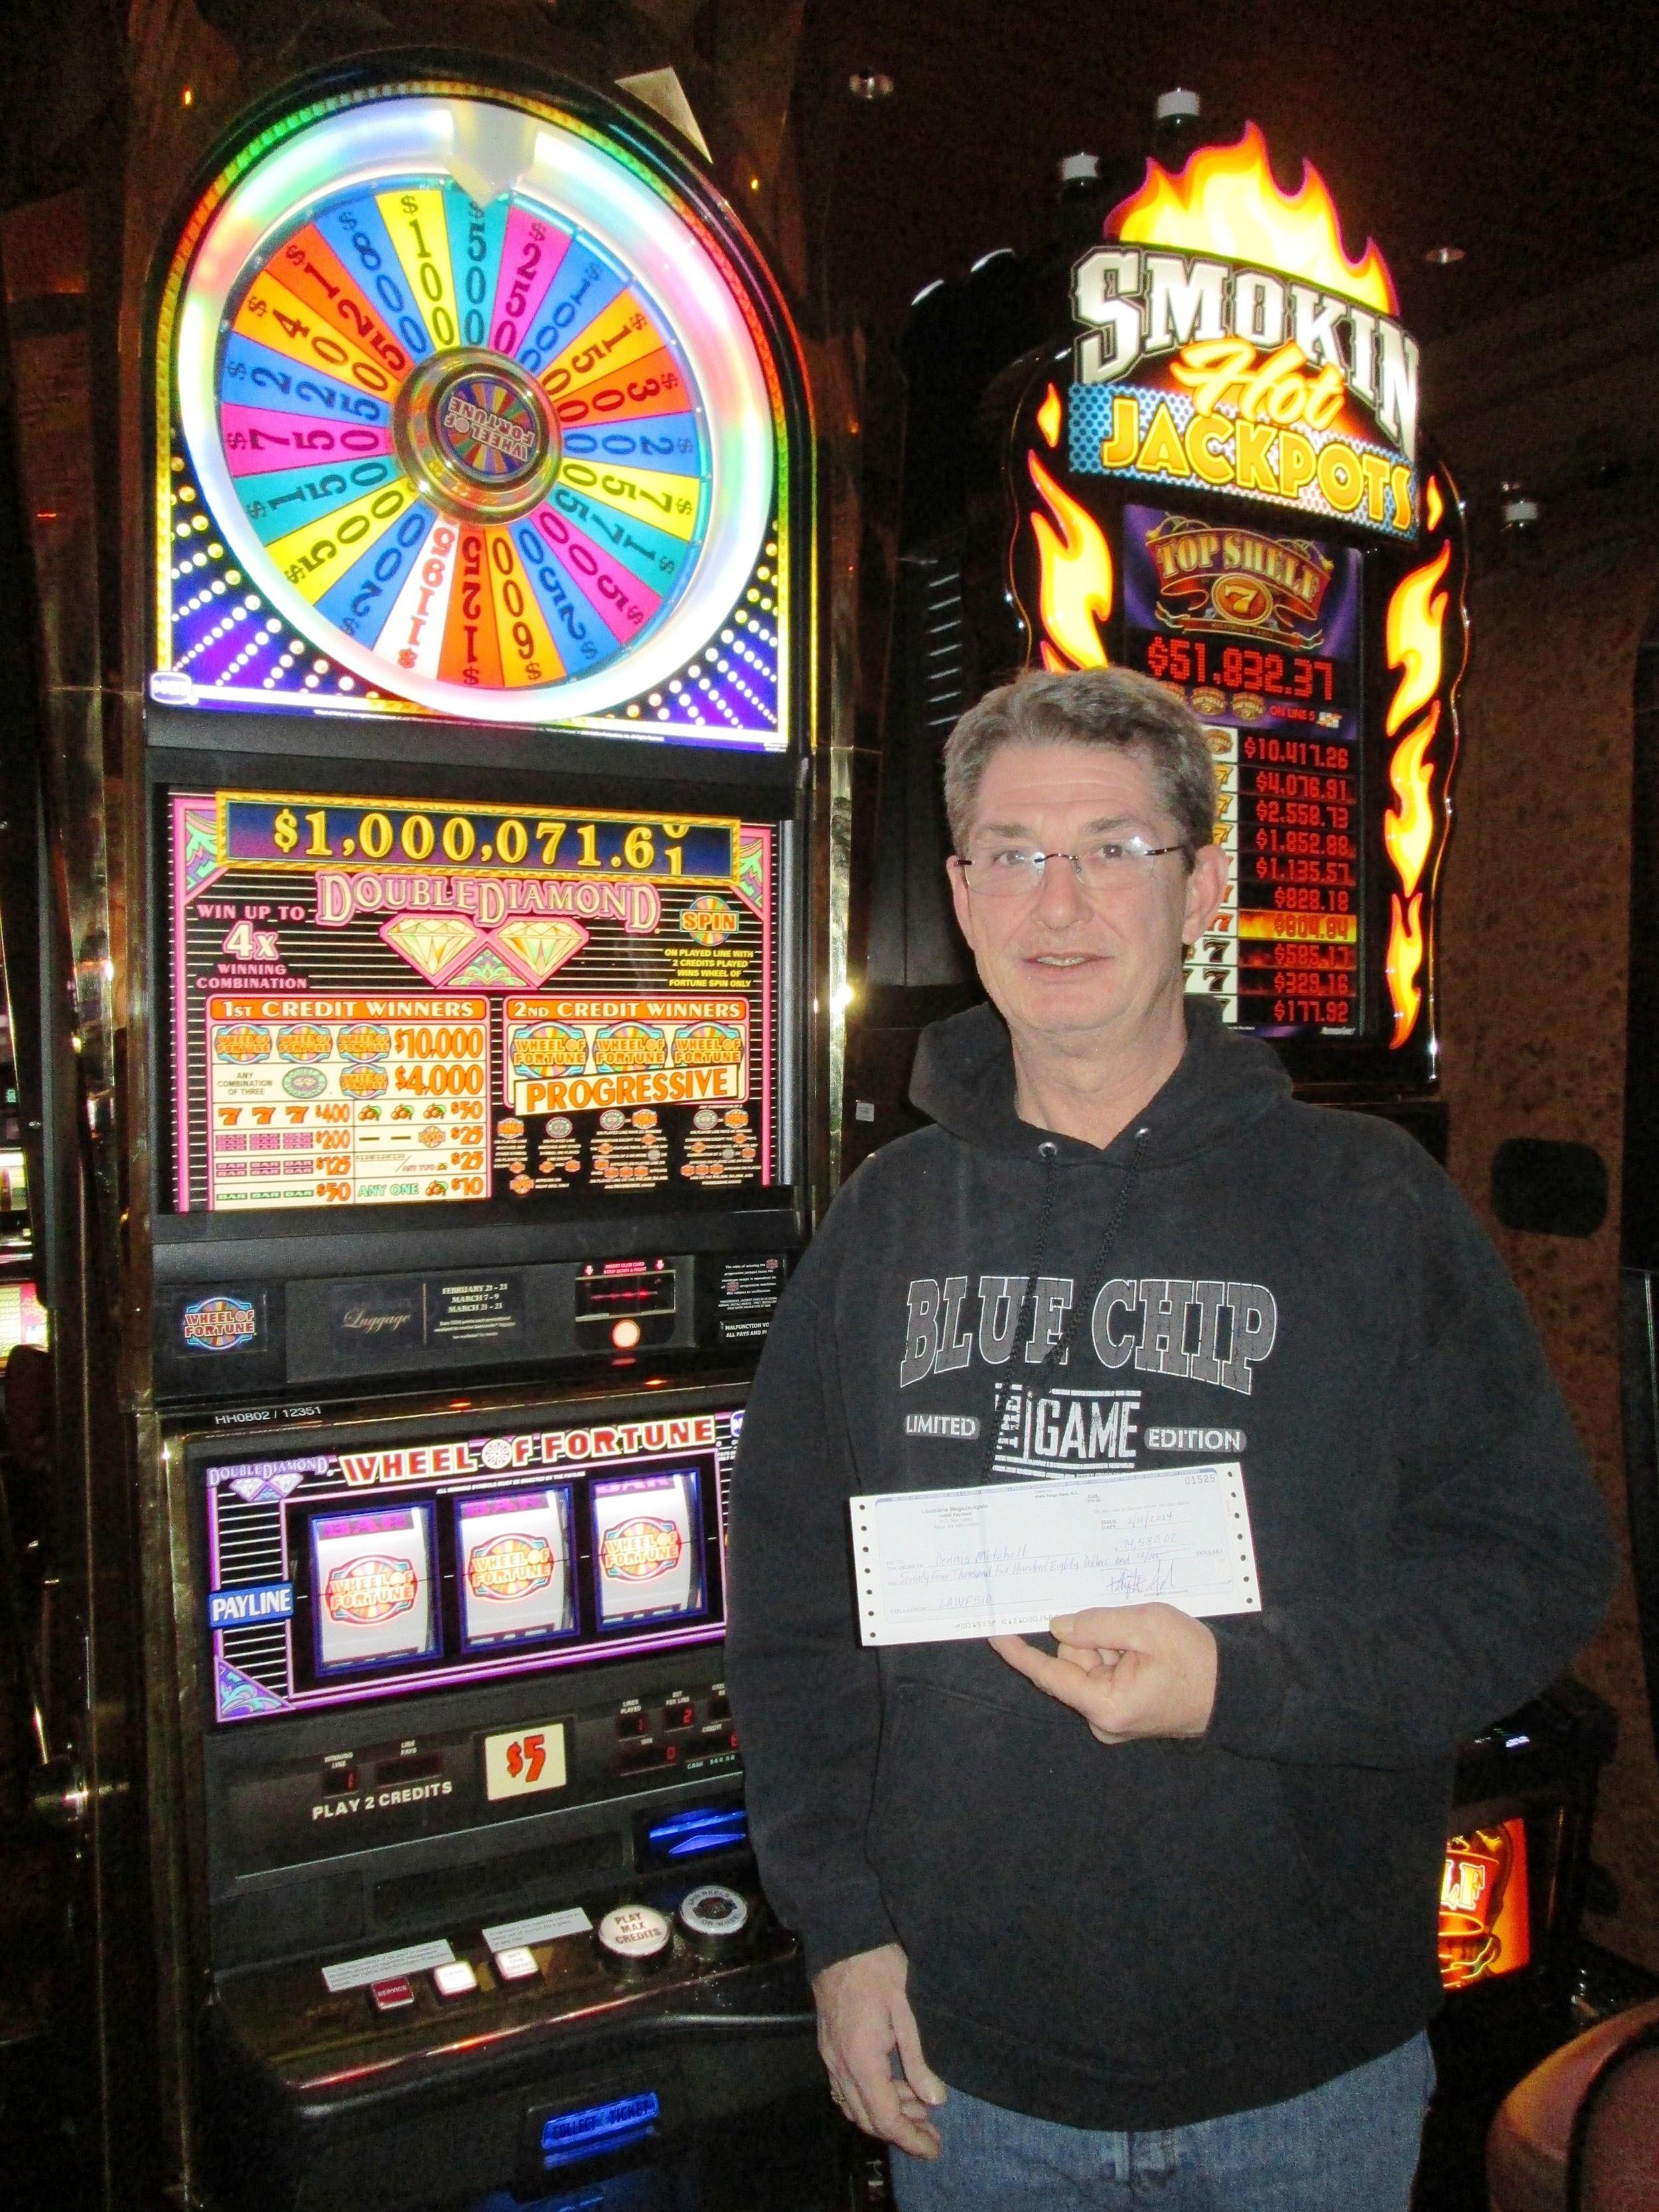 55 Loyalty Free Spins! på Yako Casino